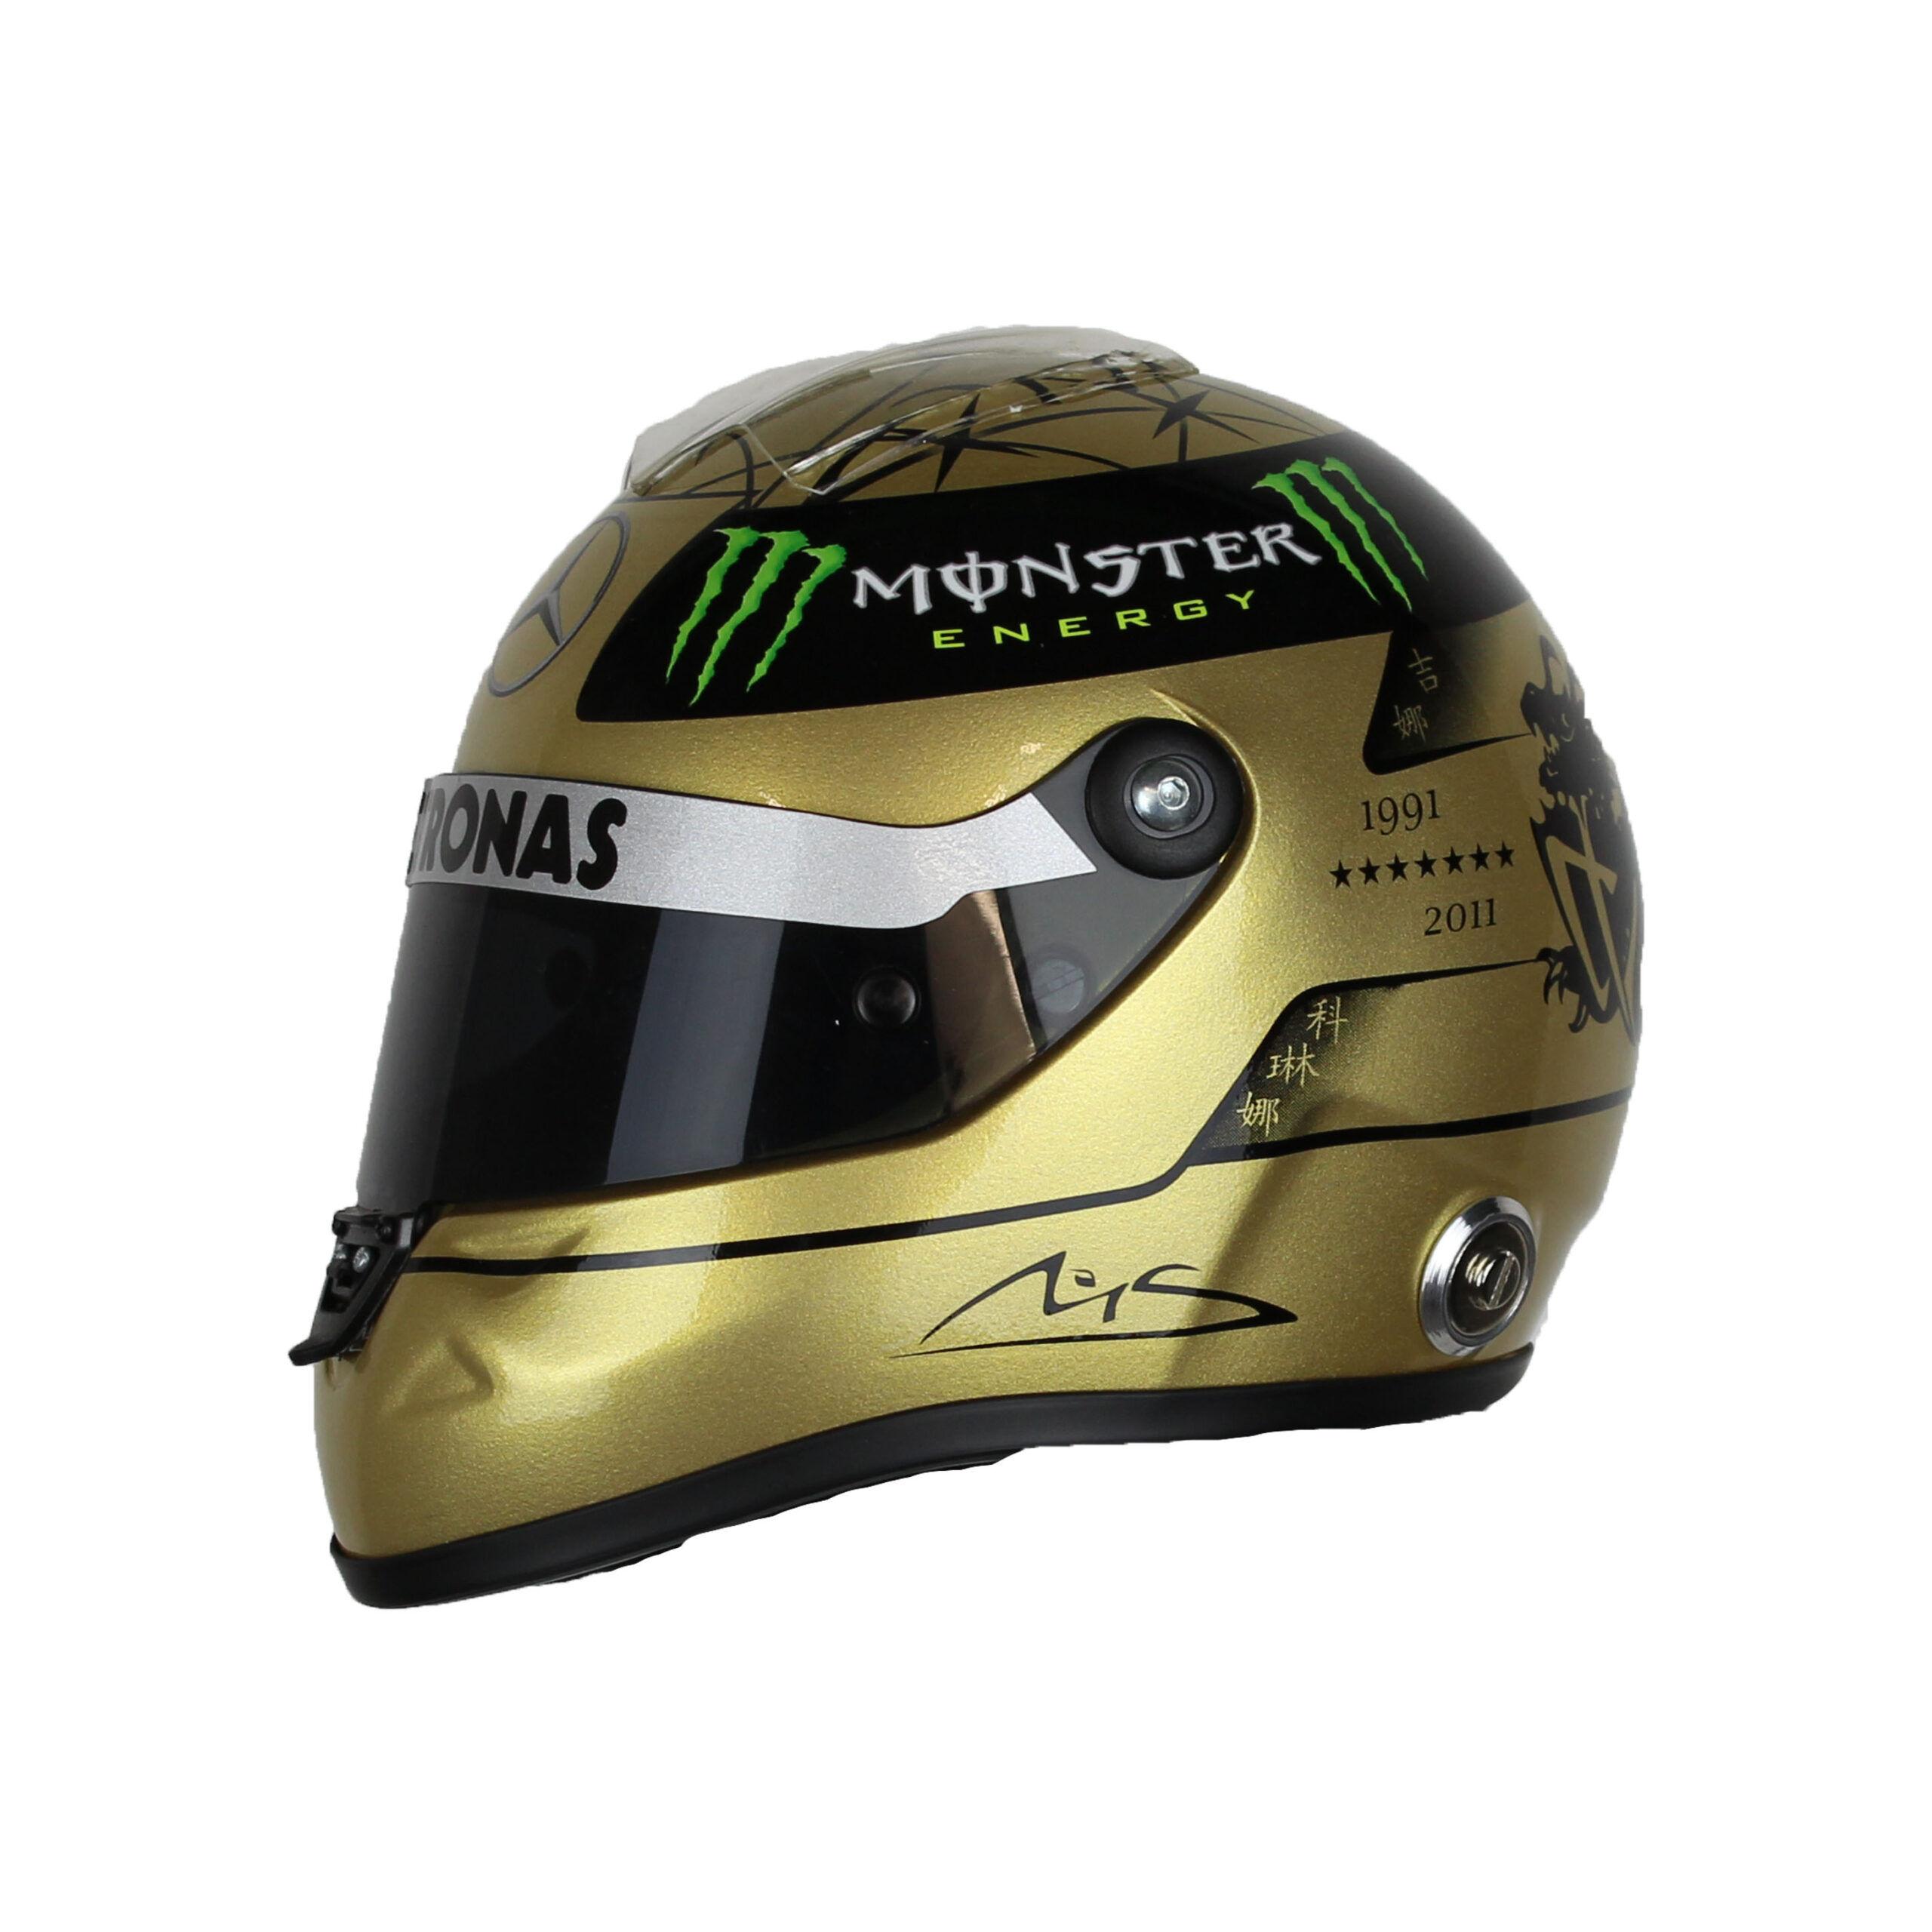 Michael Schumacher Gold Edition